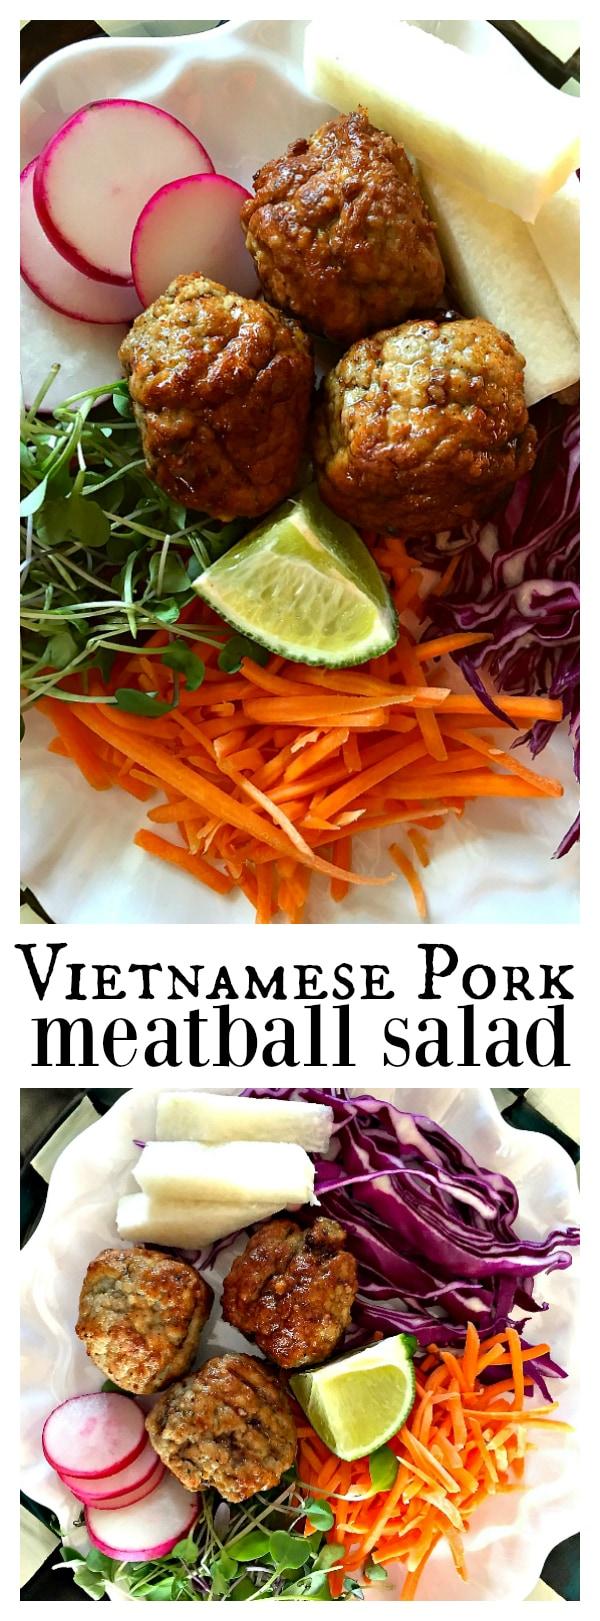 Vietnamese Pork Meatball Salad